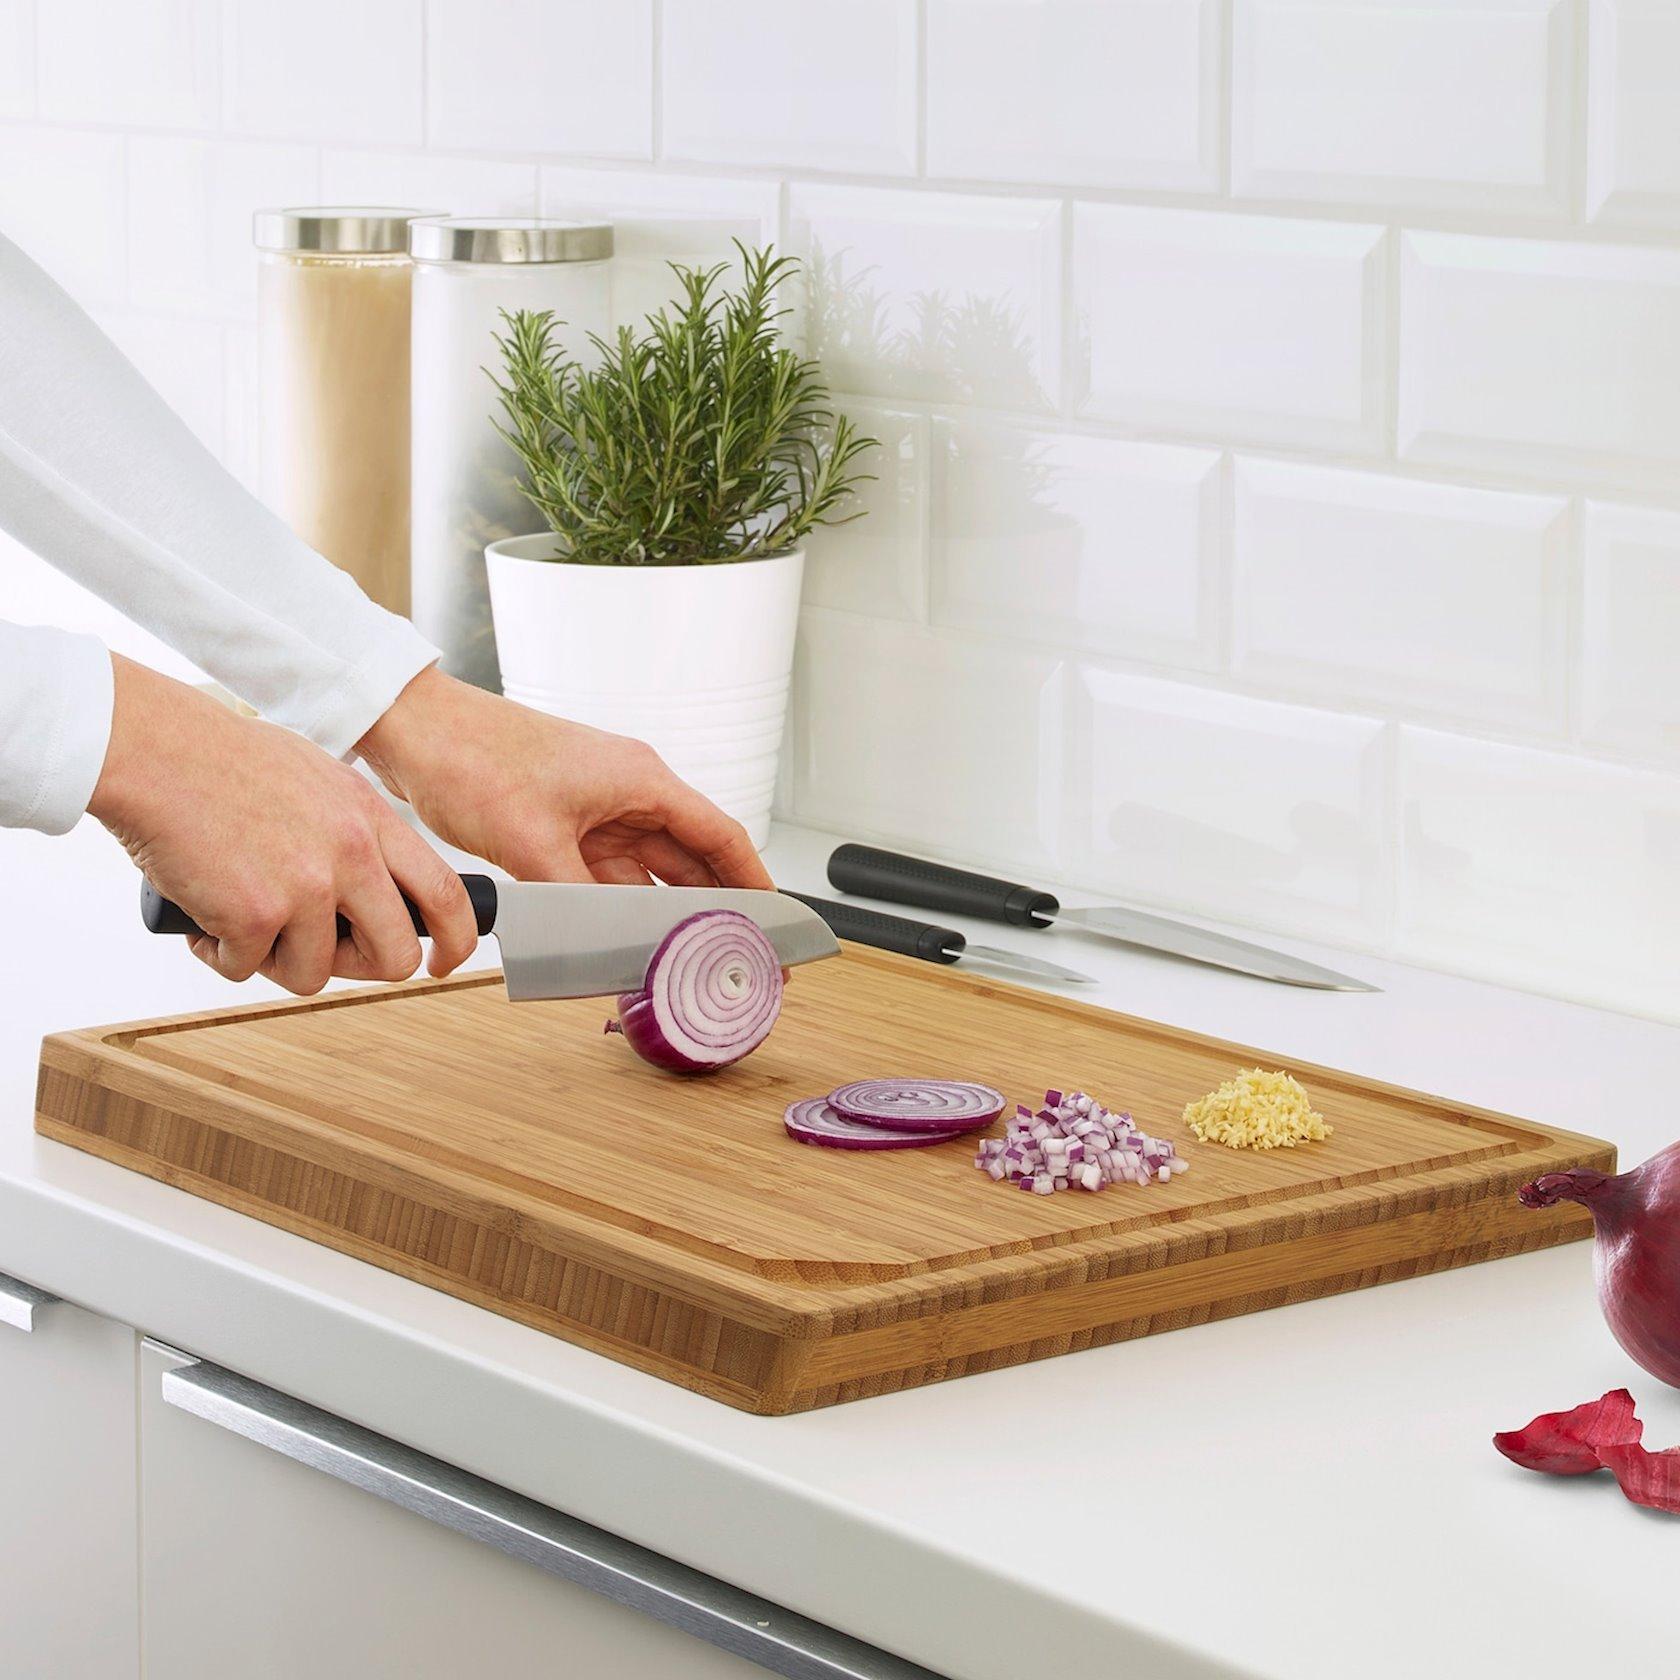 Bıçaqlar dəsti IKEA Forslag, 3 əşya. Material: Paslanmayan polad, Polipropilen, Sintetik kauçuk, Yapışmayan örtük.